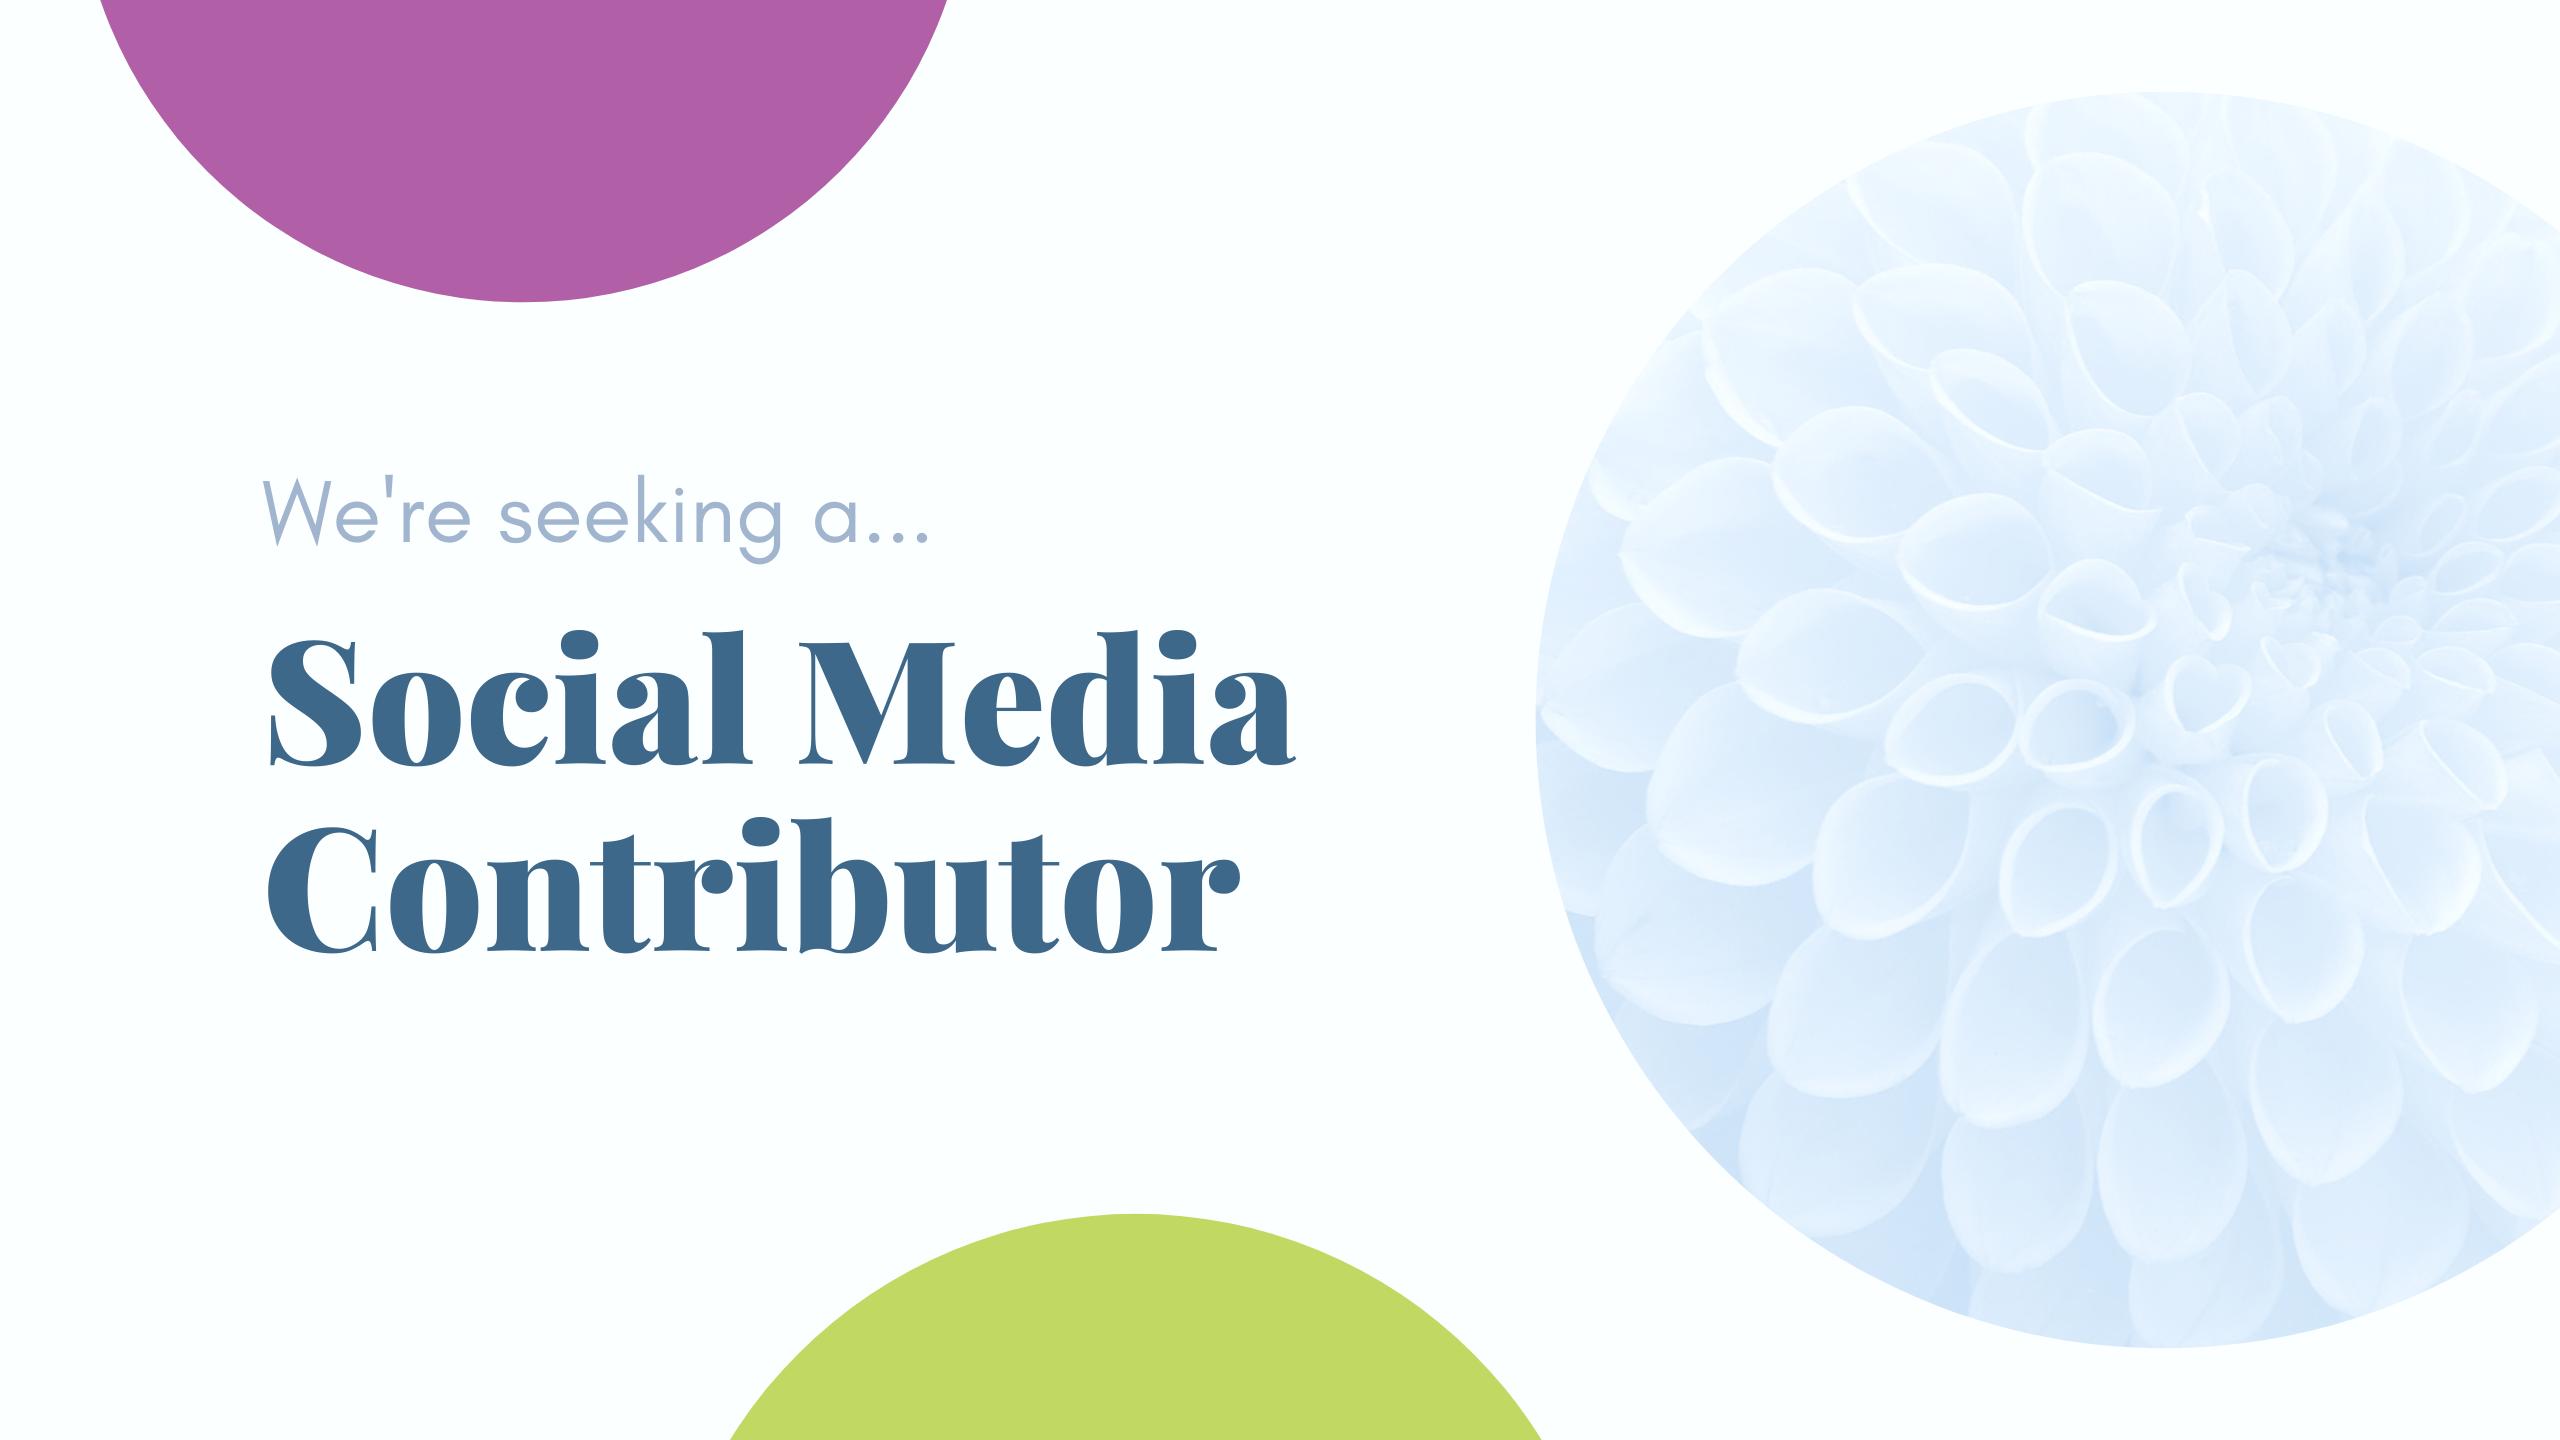 Social Media Contributor